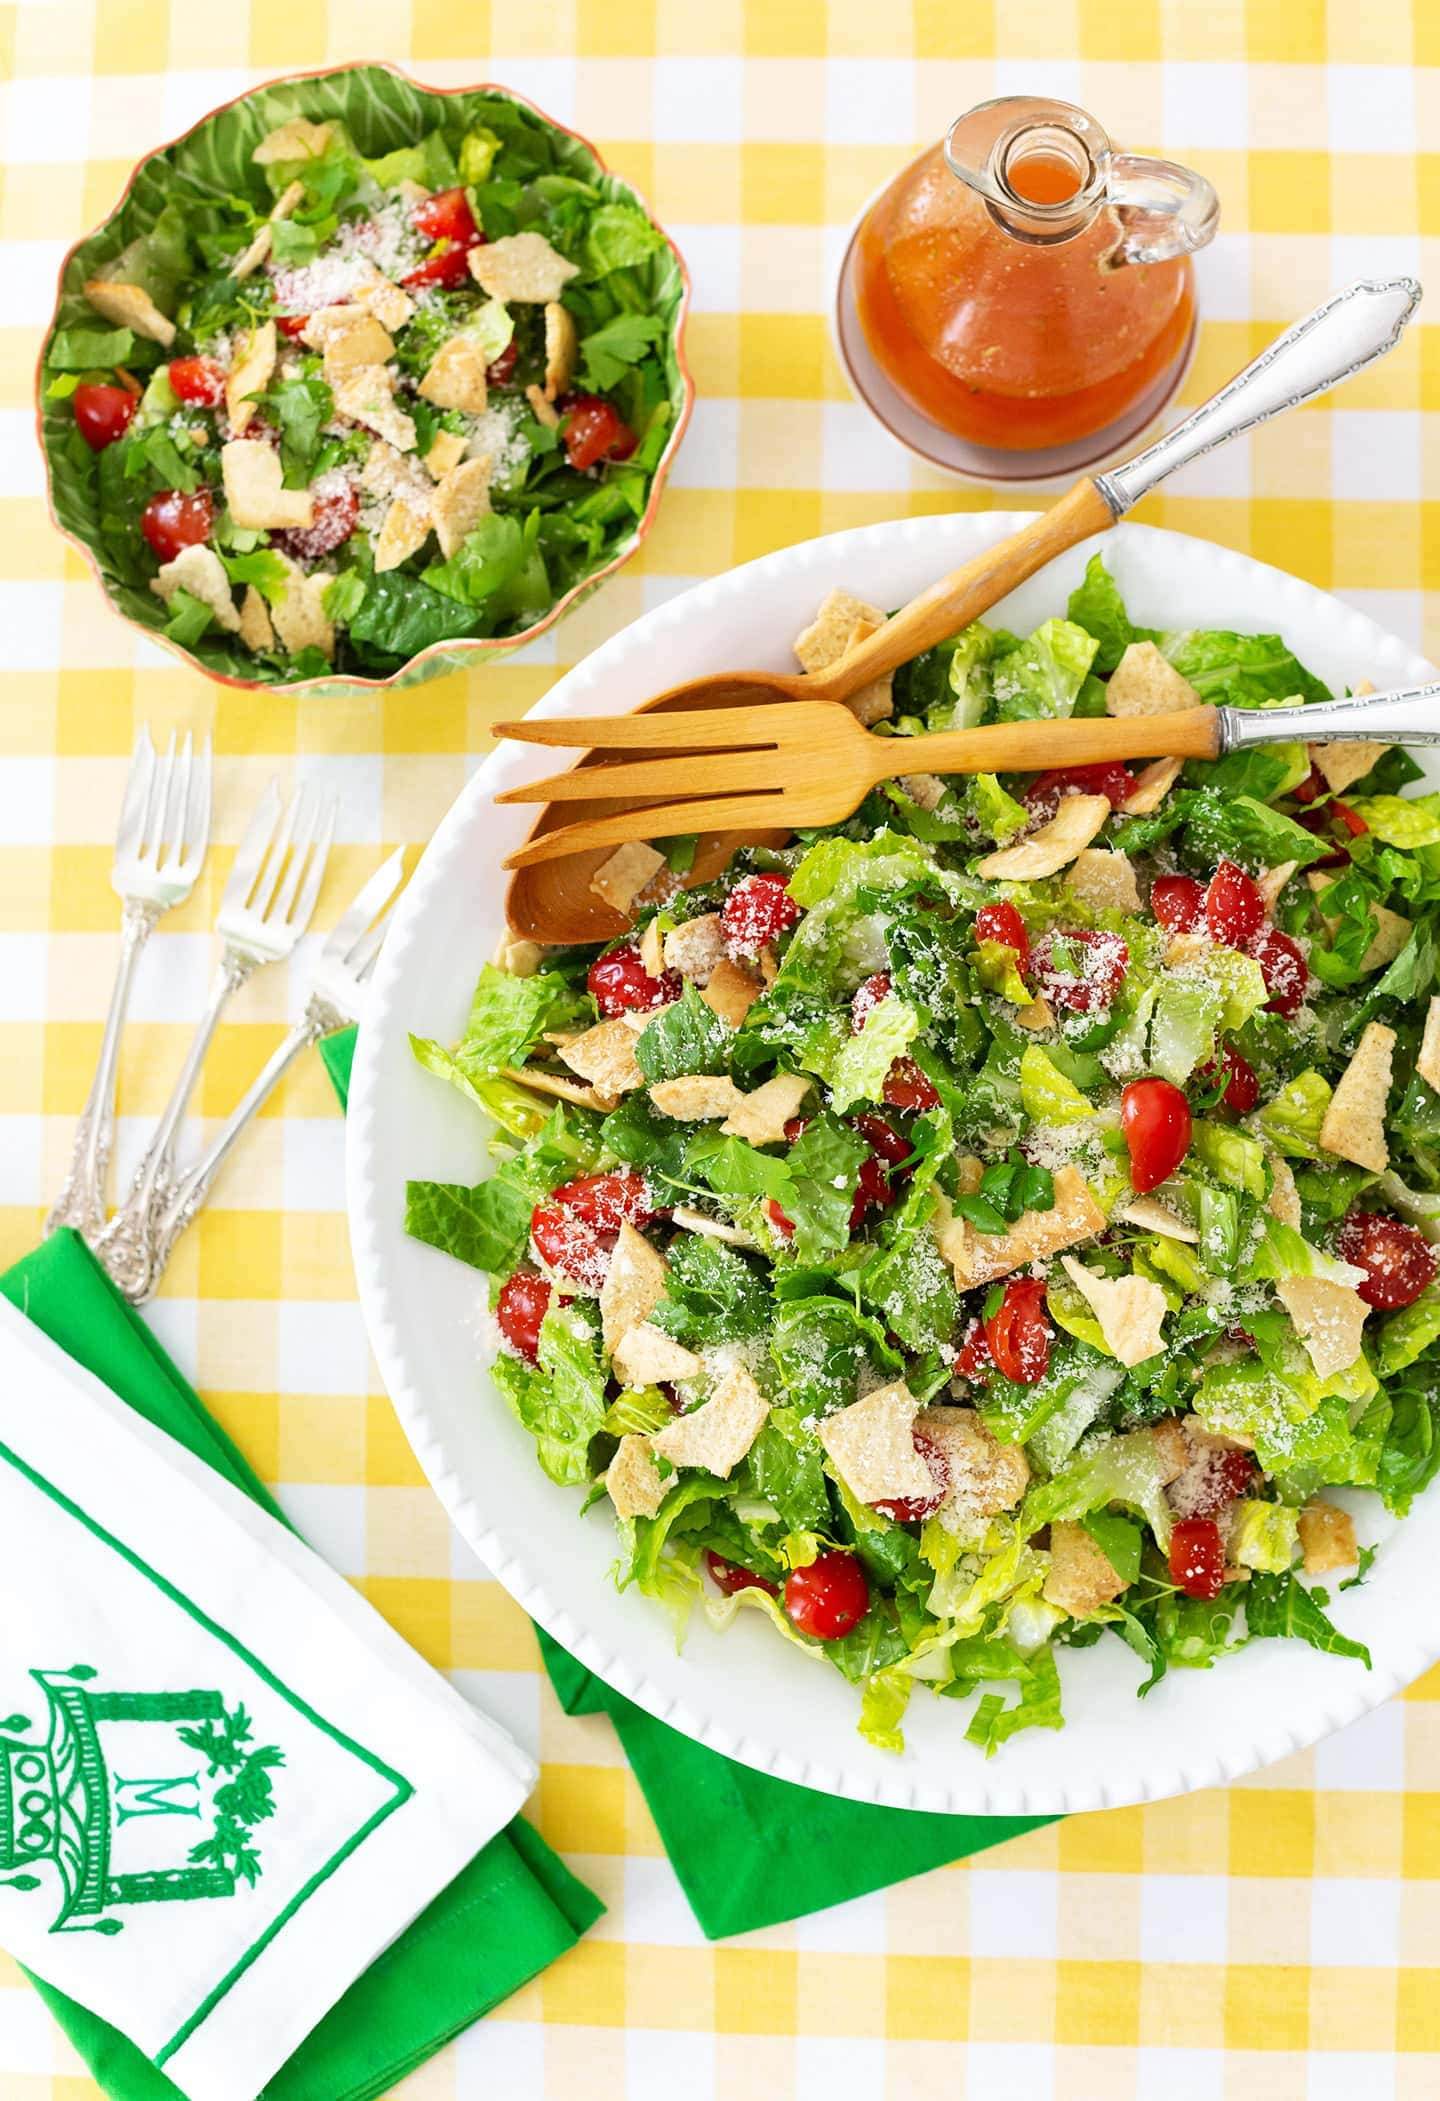 Famous green jacket salad from Green Jacket restaurant in Augusta, GA.